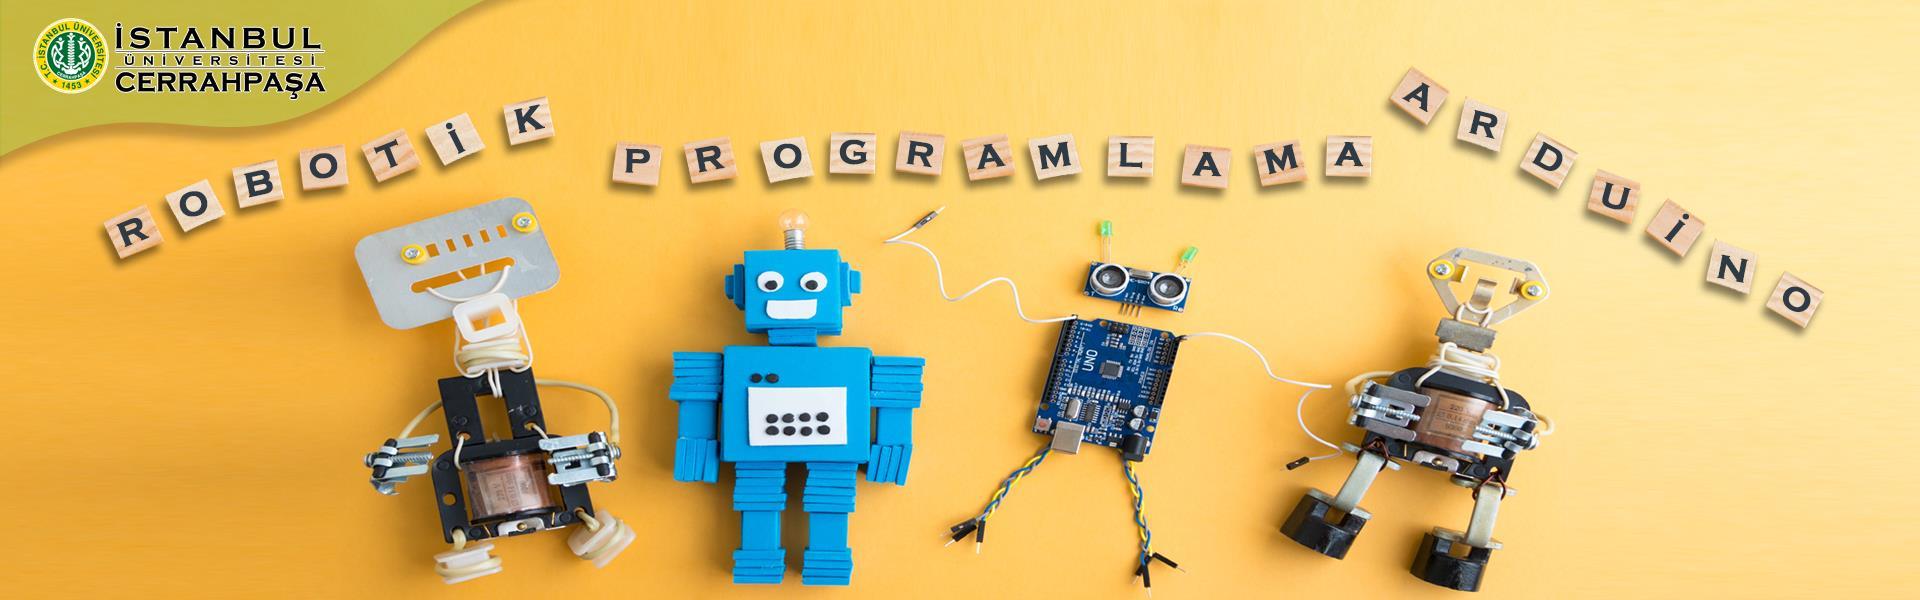 arduino robotik programlama eğitici-eğitimi sertifika-programı